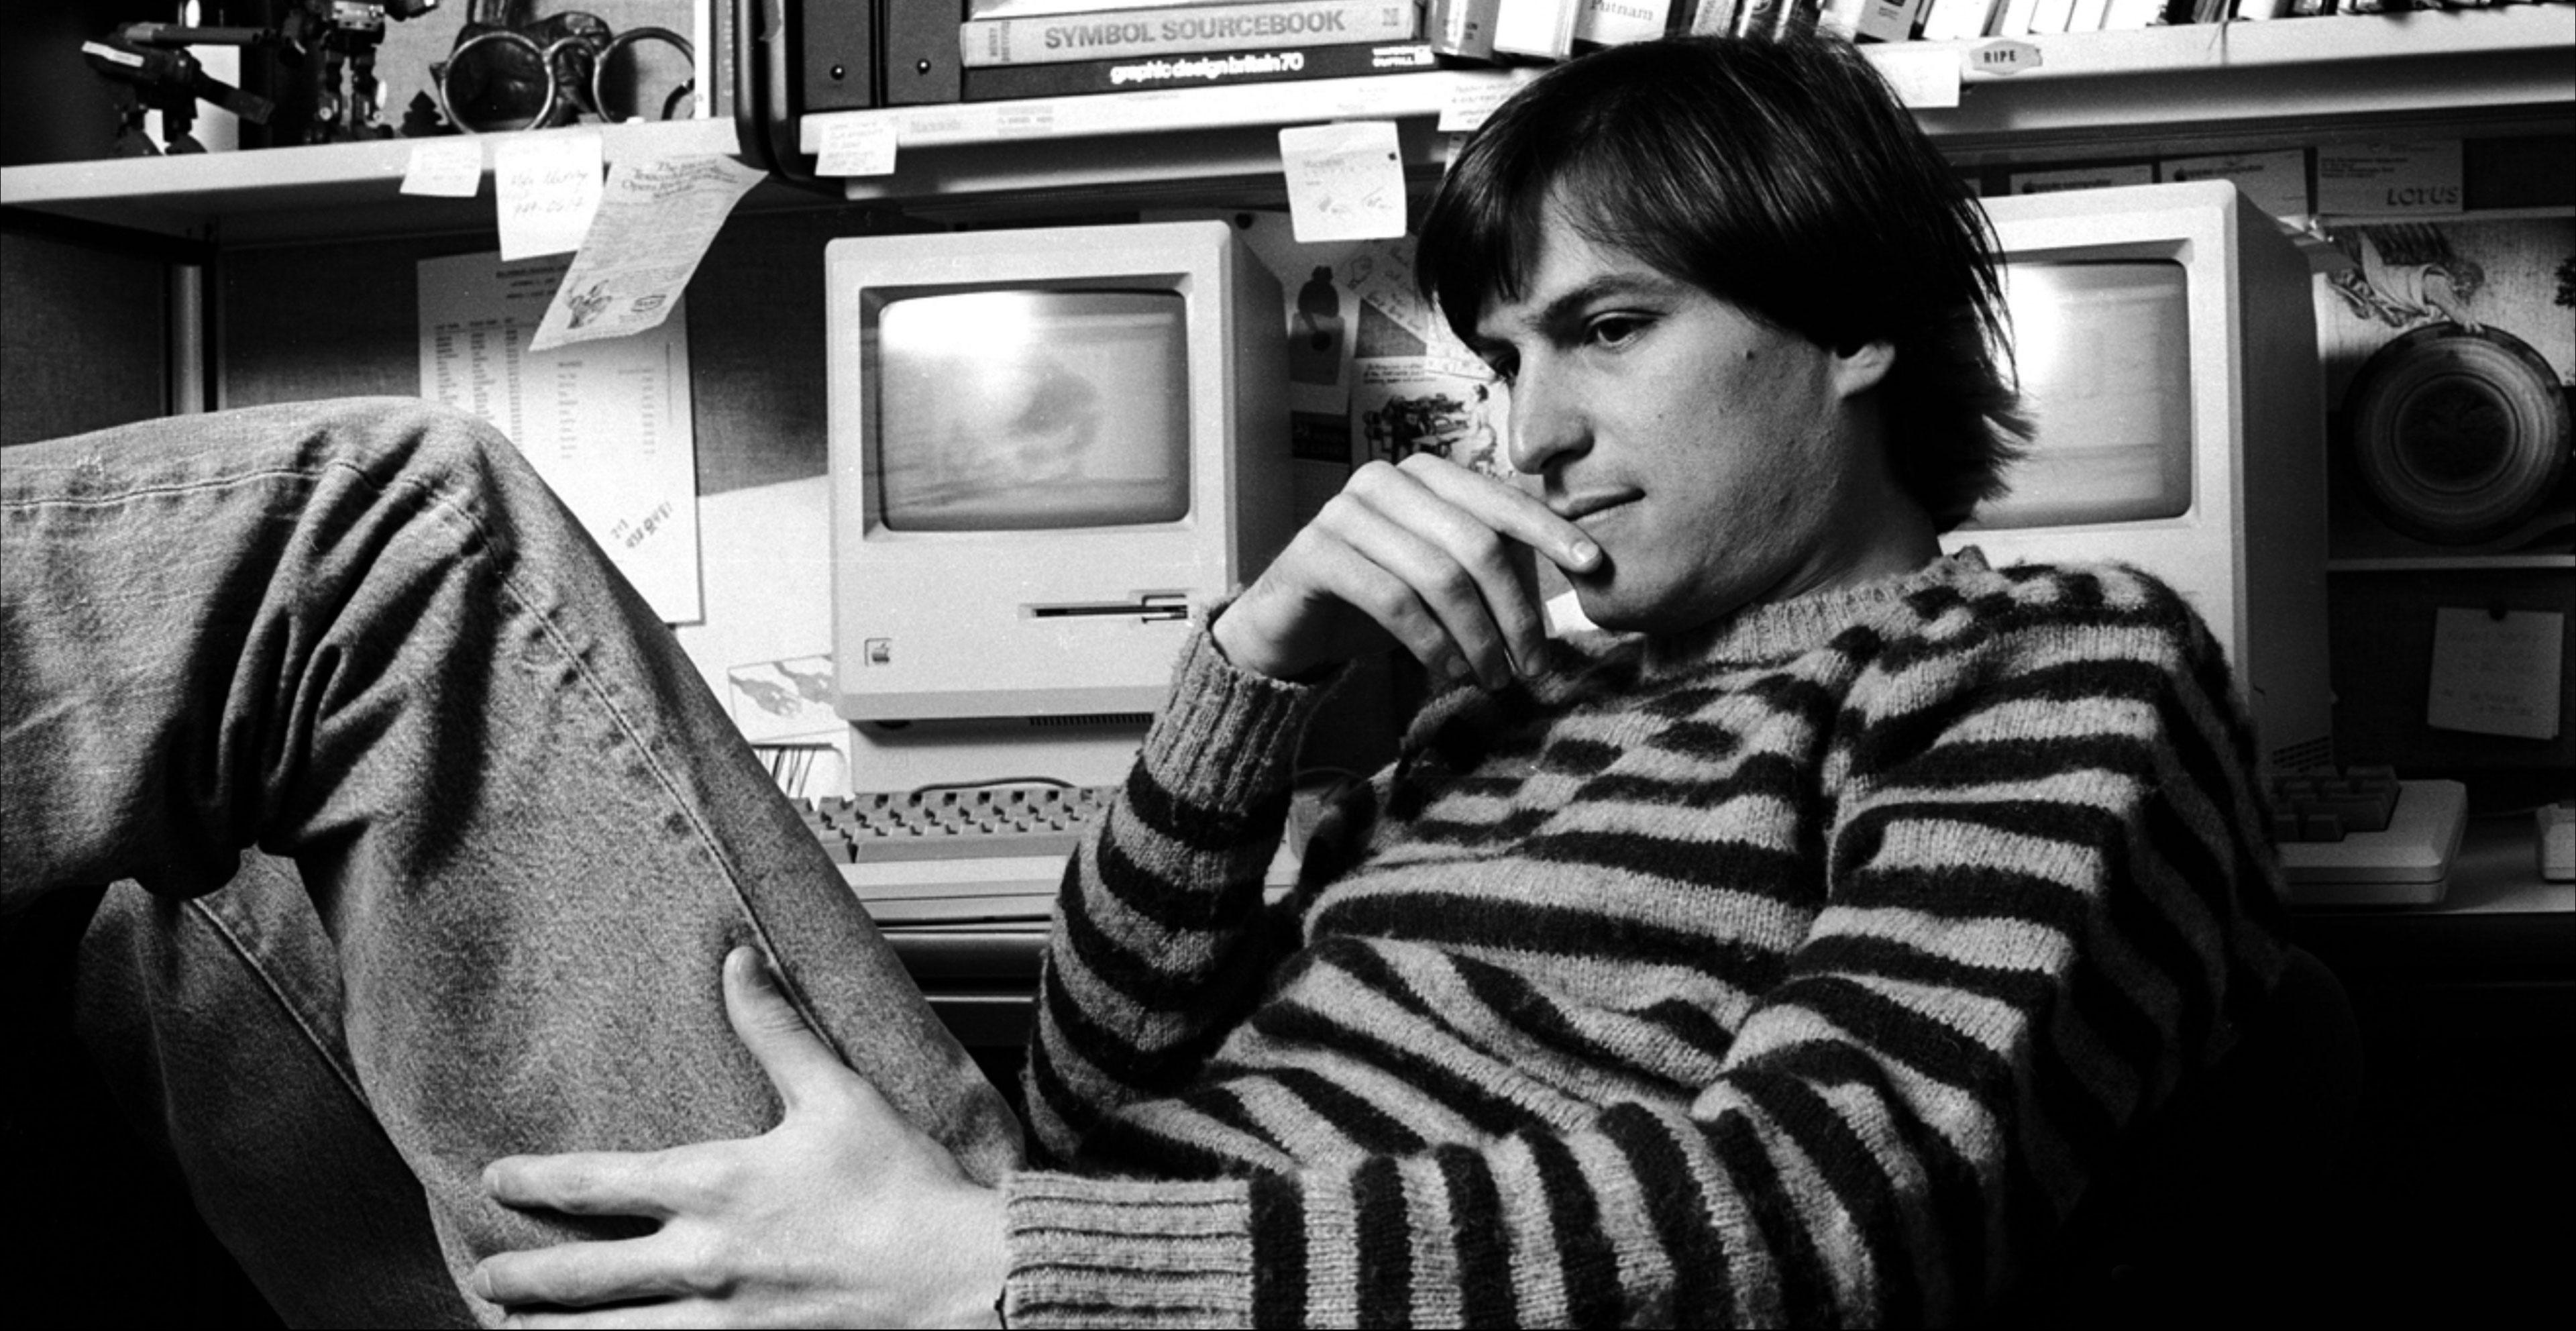 Steve Jobs HD Wallpaper. Steve_jobs_HD Wallpaper